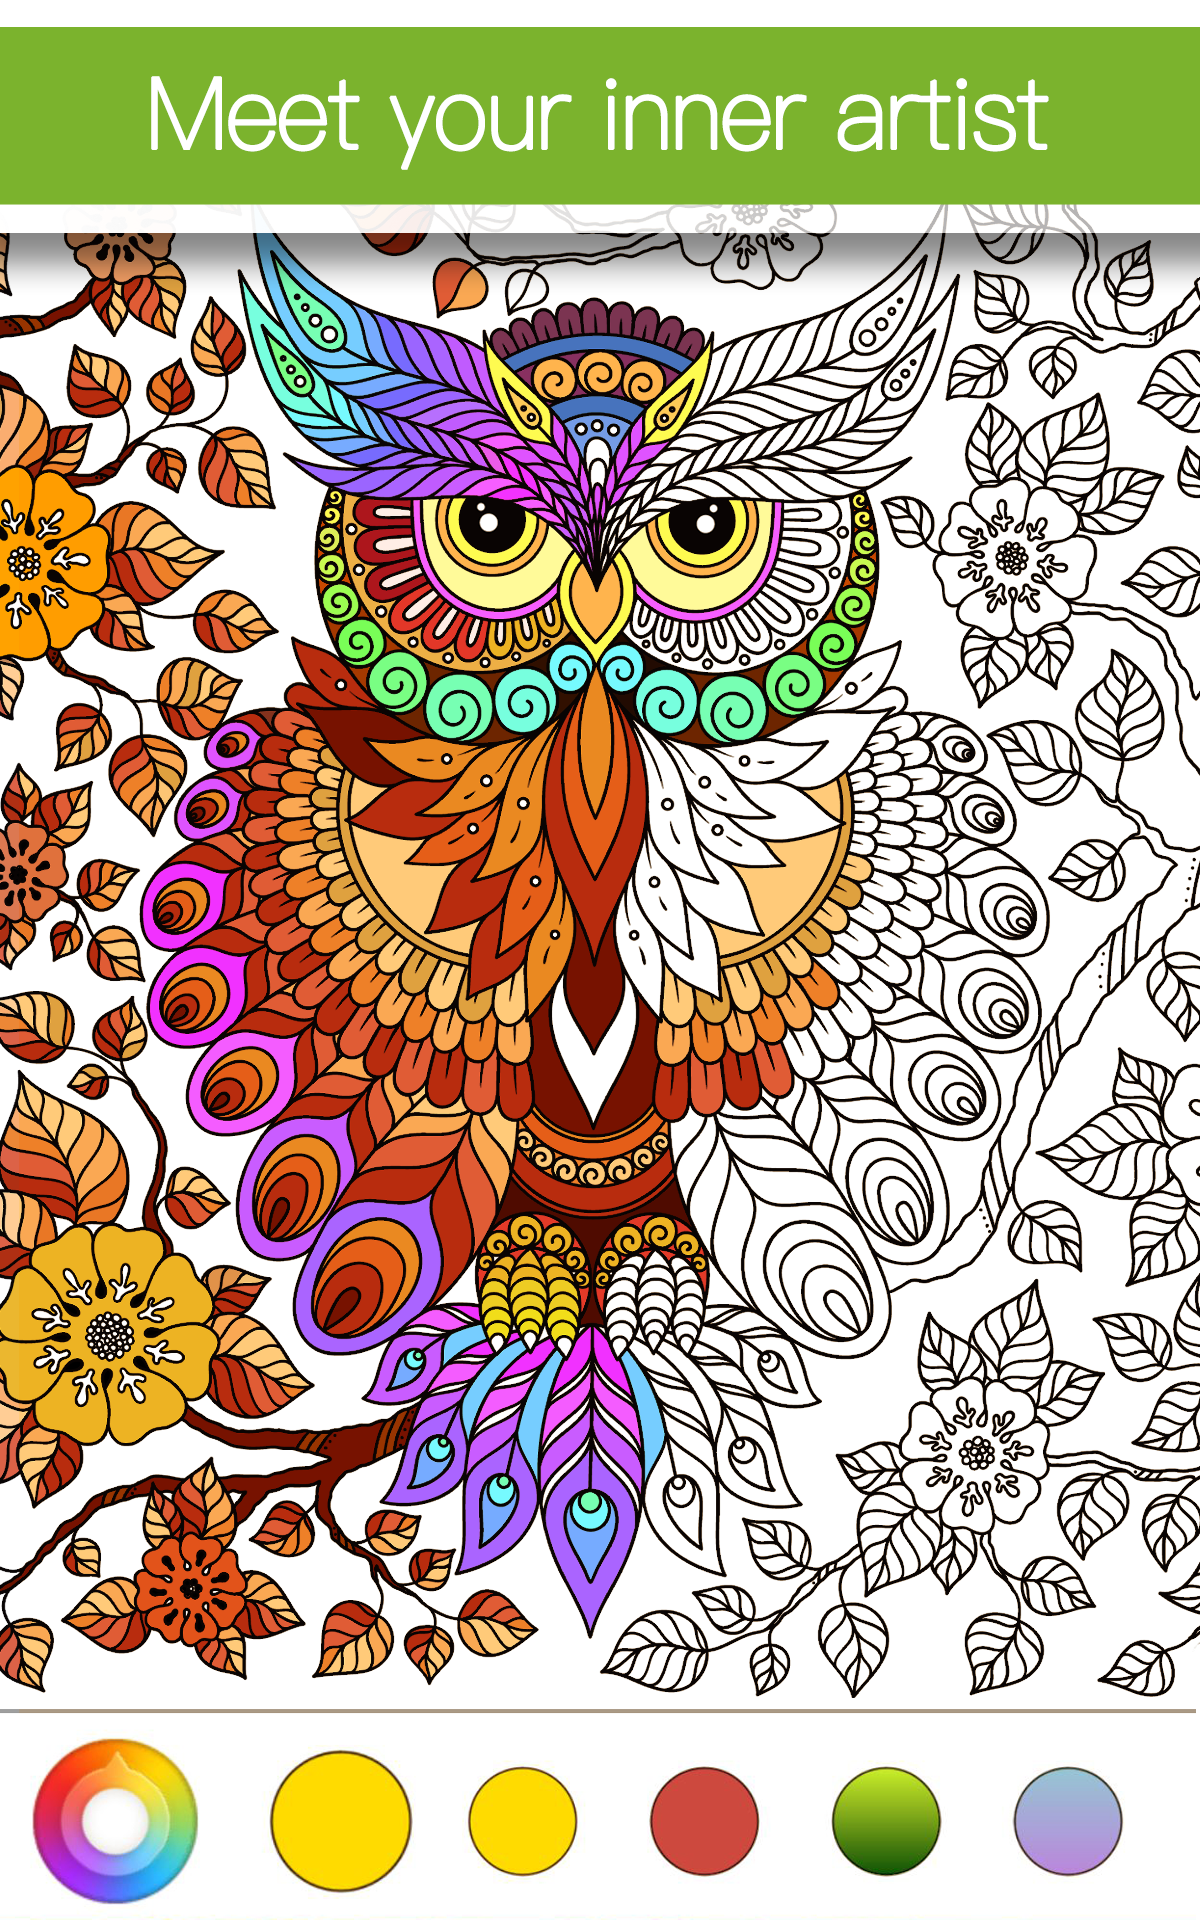 Coloring Apps for Adults Premium: Amazon.com.au: Appstore ...